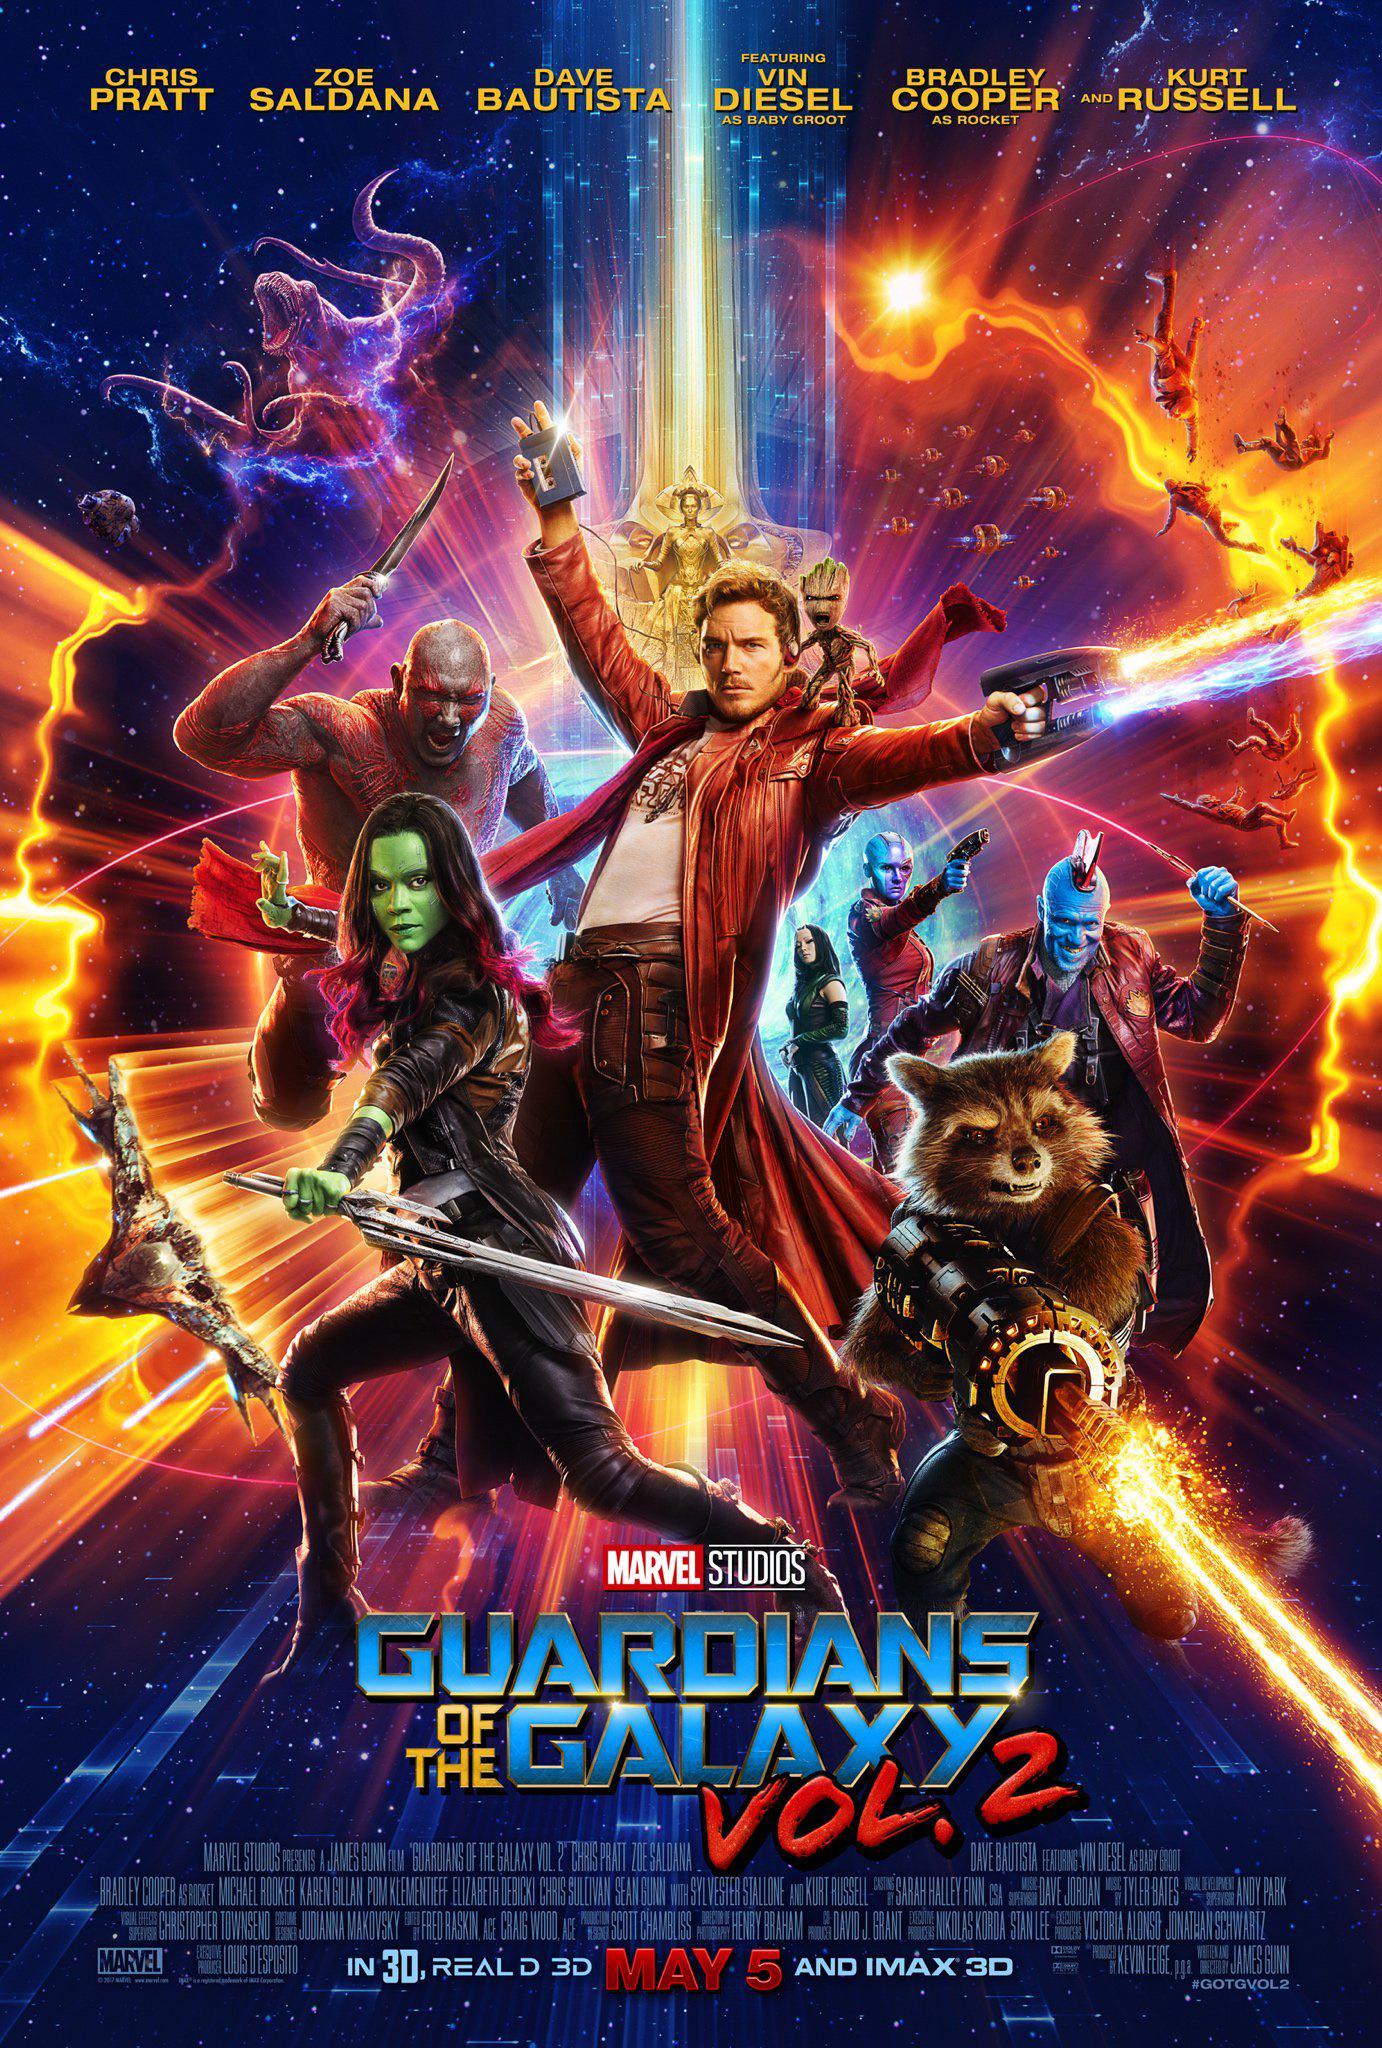 Guardians of the Galaxy Vol. 2 | James Gunn | Marvel Studios/Walt Disney Pictures